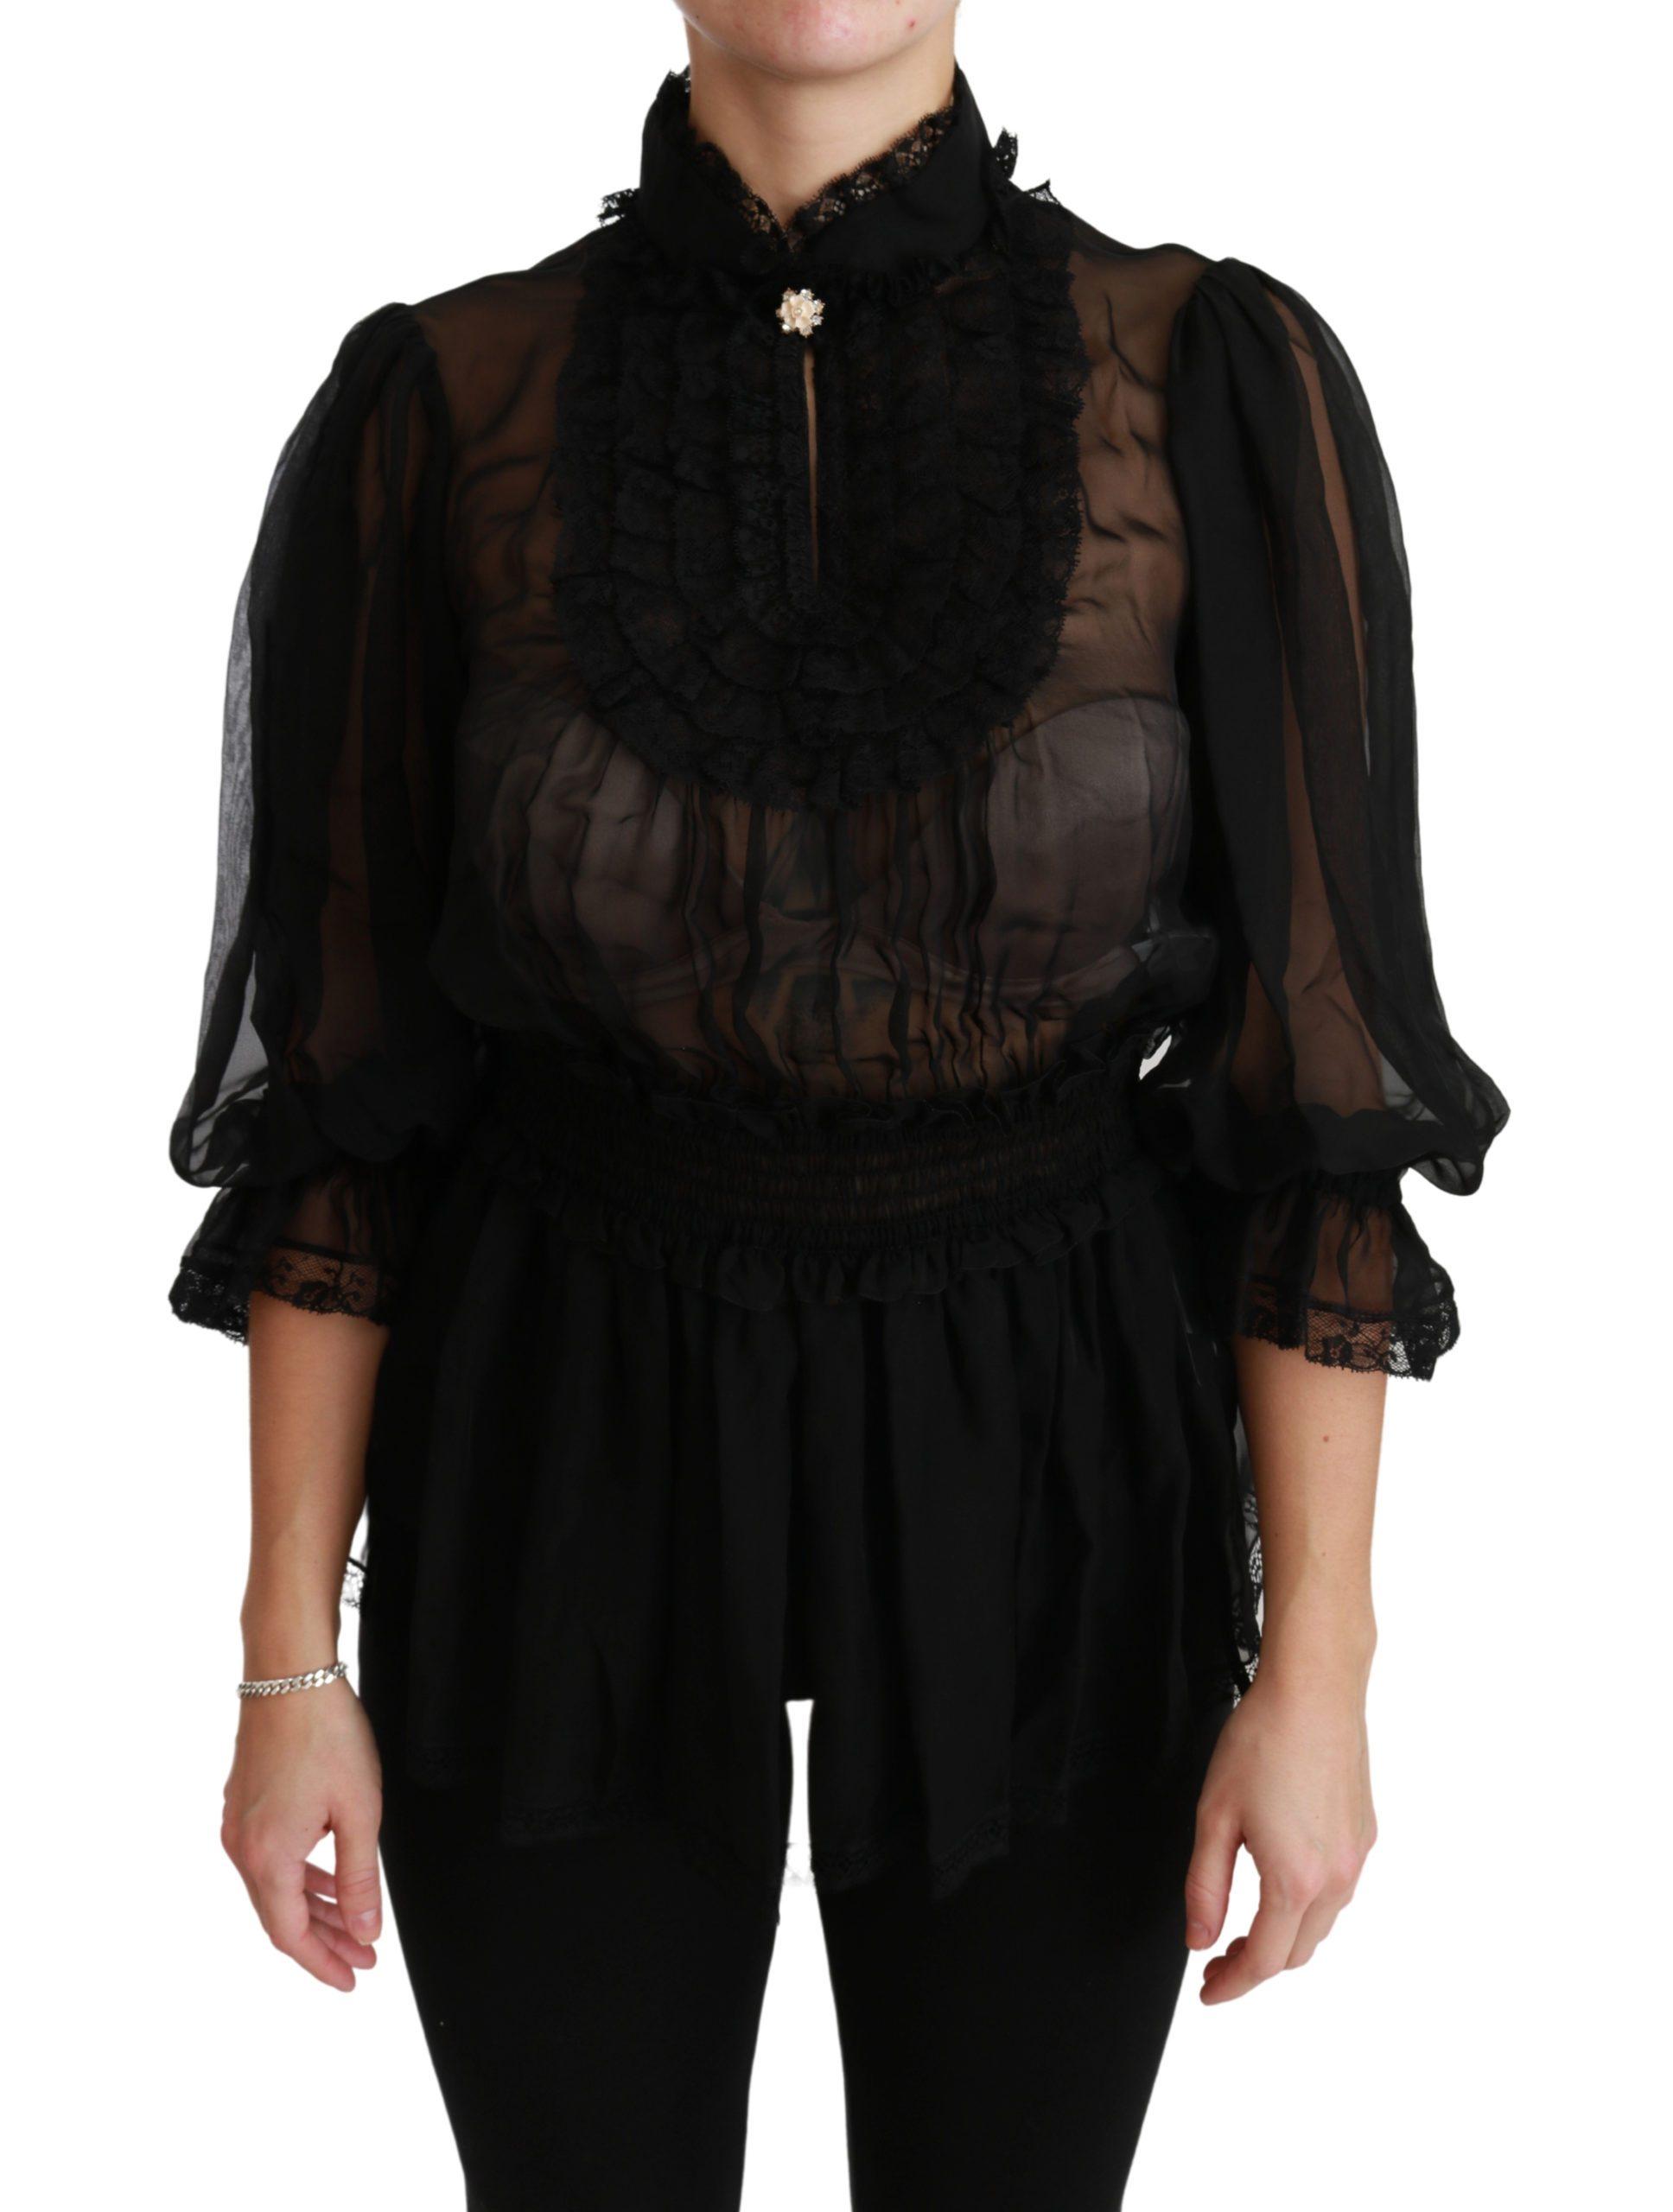 Black Lace Sheer Blouse Shirt Silk Top - IT40|S